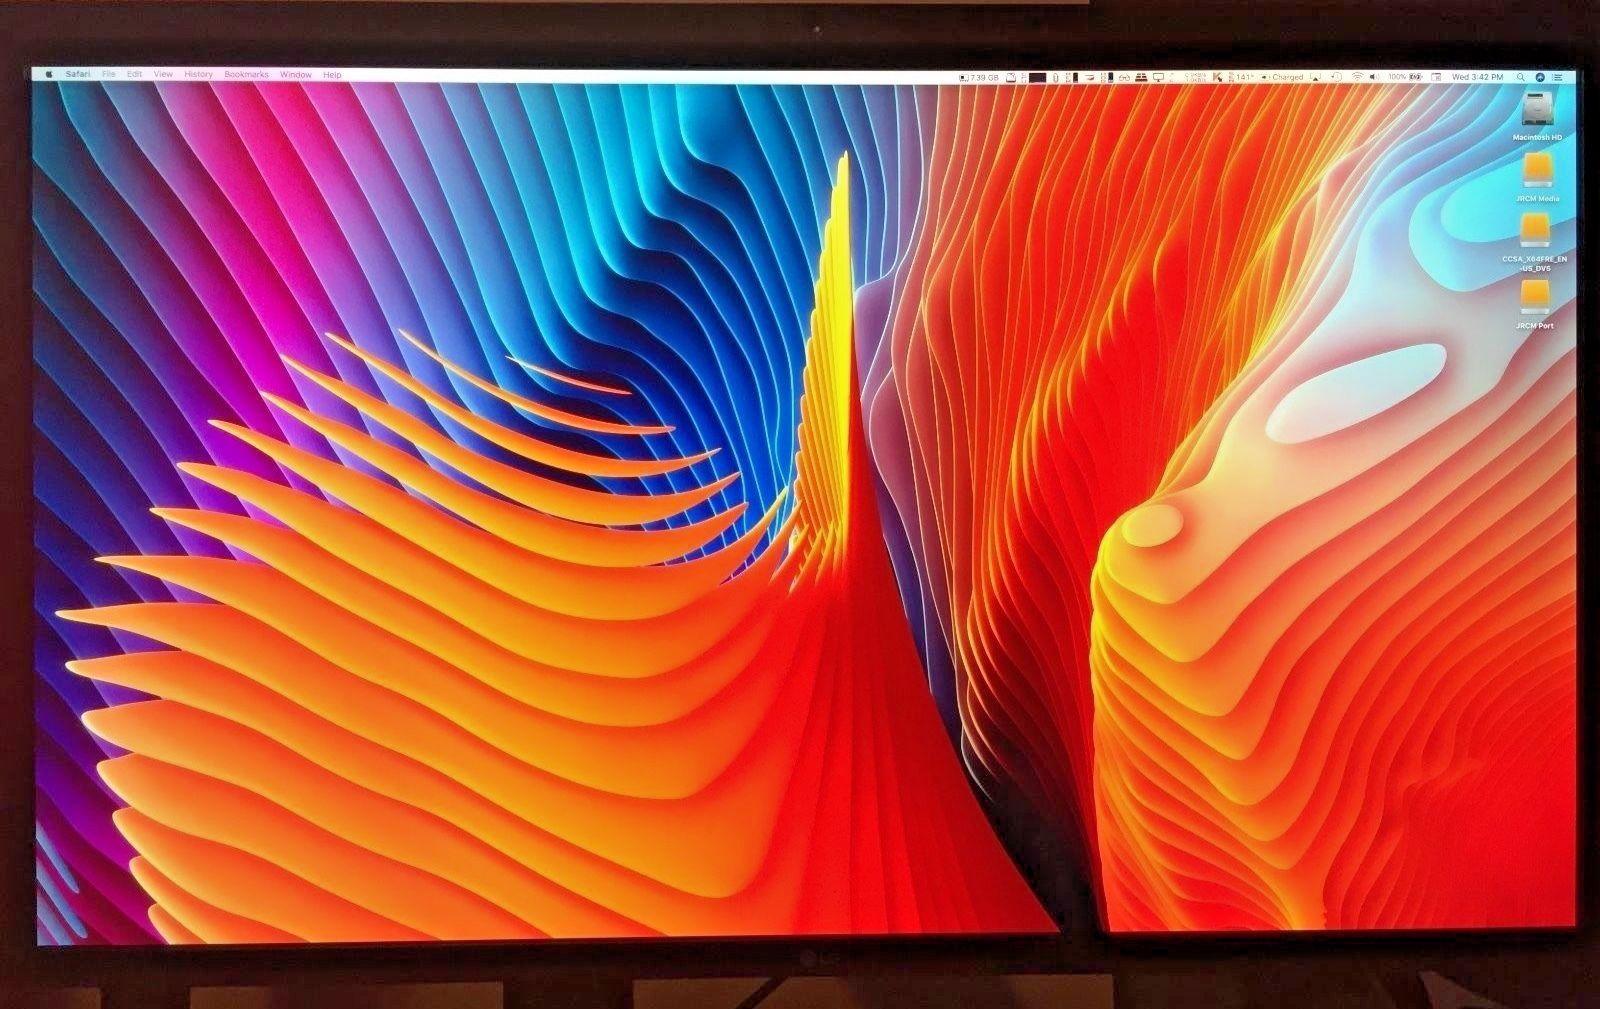 "LG UltraFine 5K 27"" IPS LED Display / Monitor"